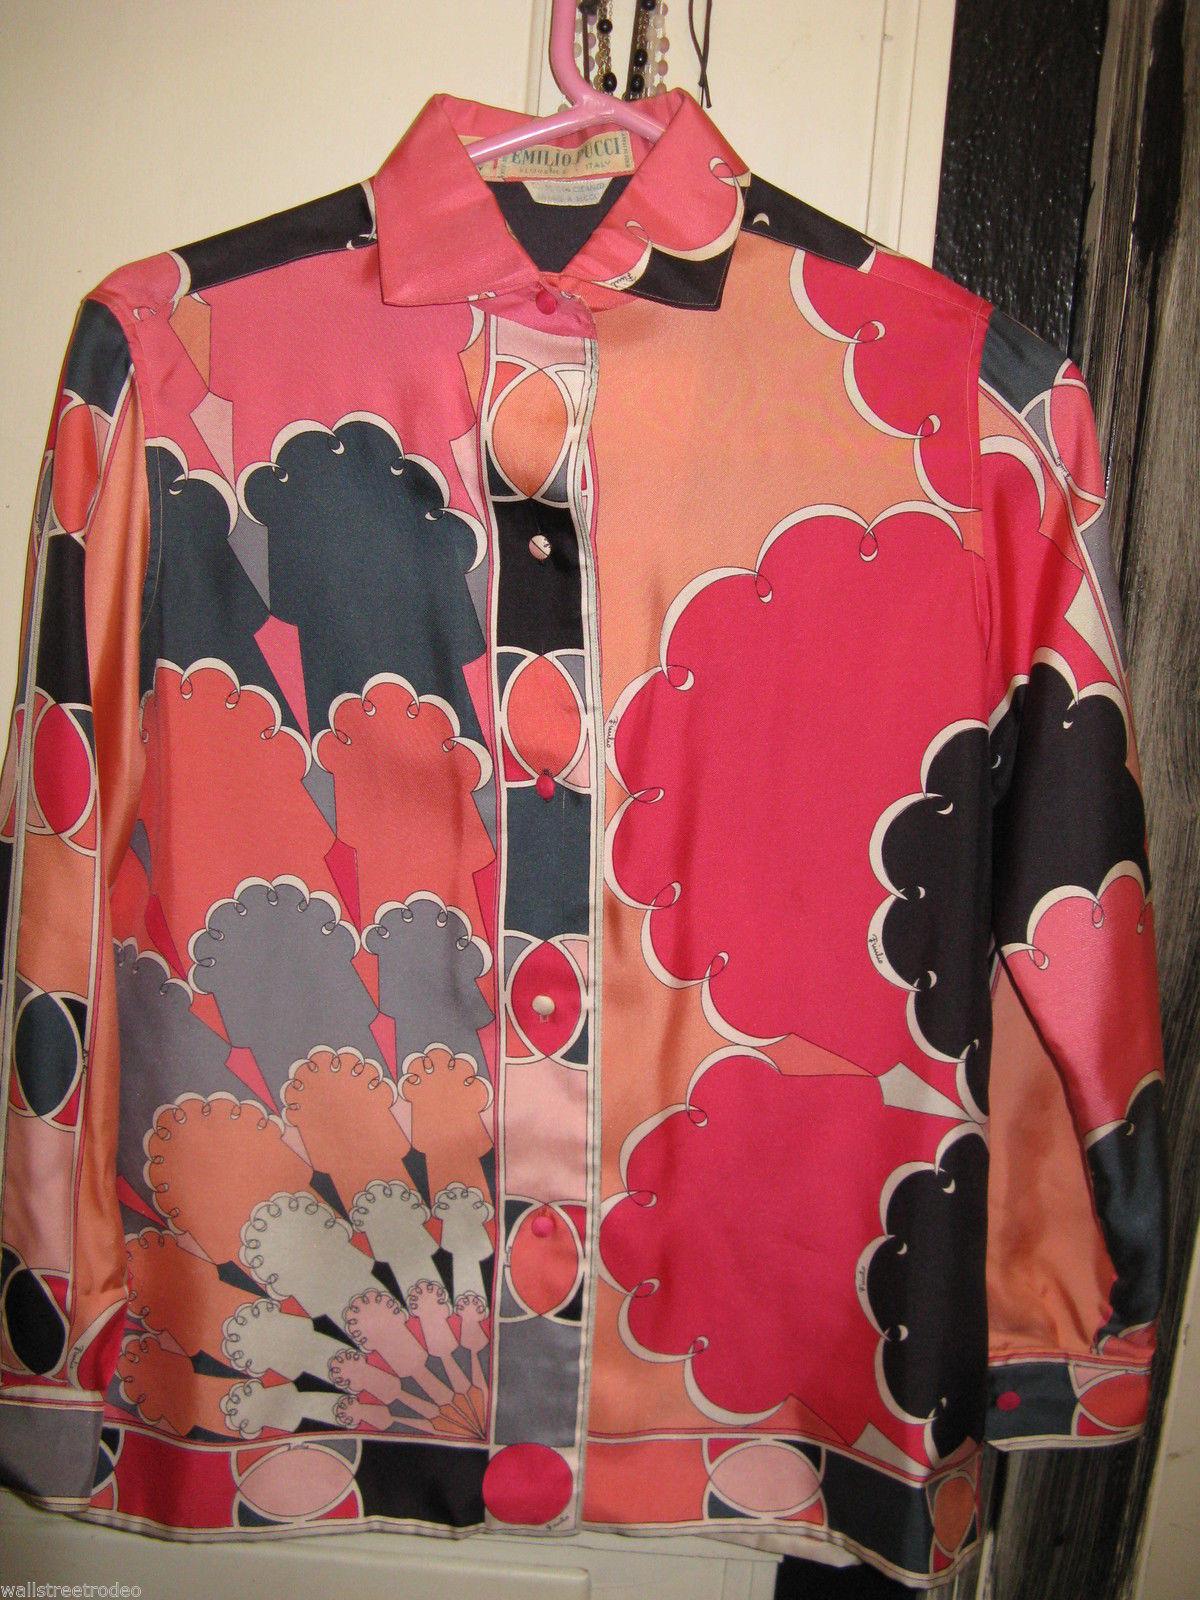 Vintage Emilio Pucci Saks fifth Avenue Iconic pop art silk 1960s Italy shirt 8